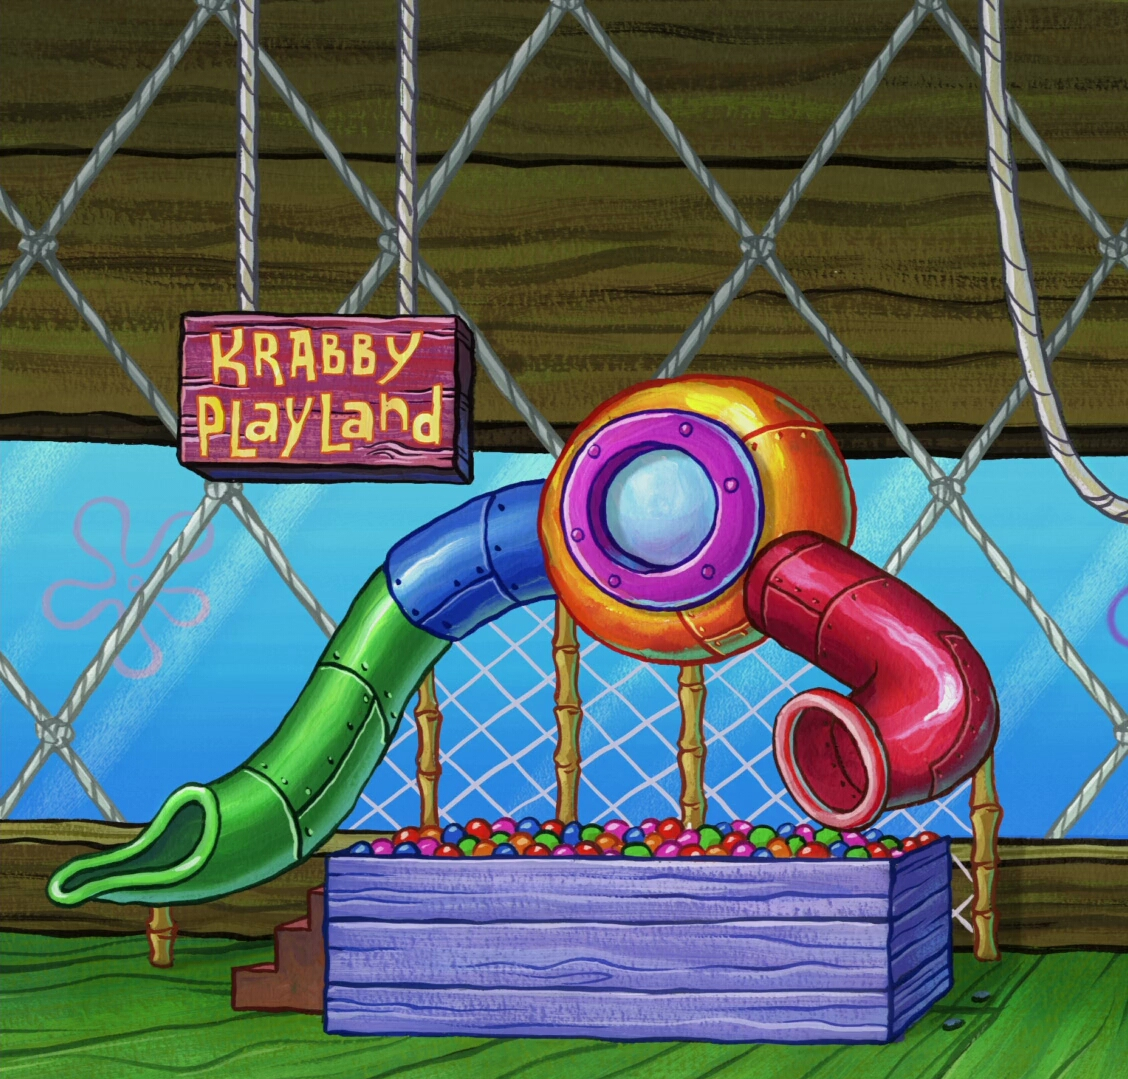 Krabby Playland